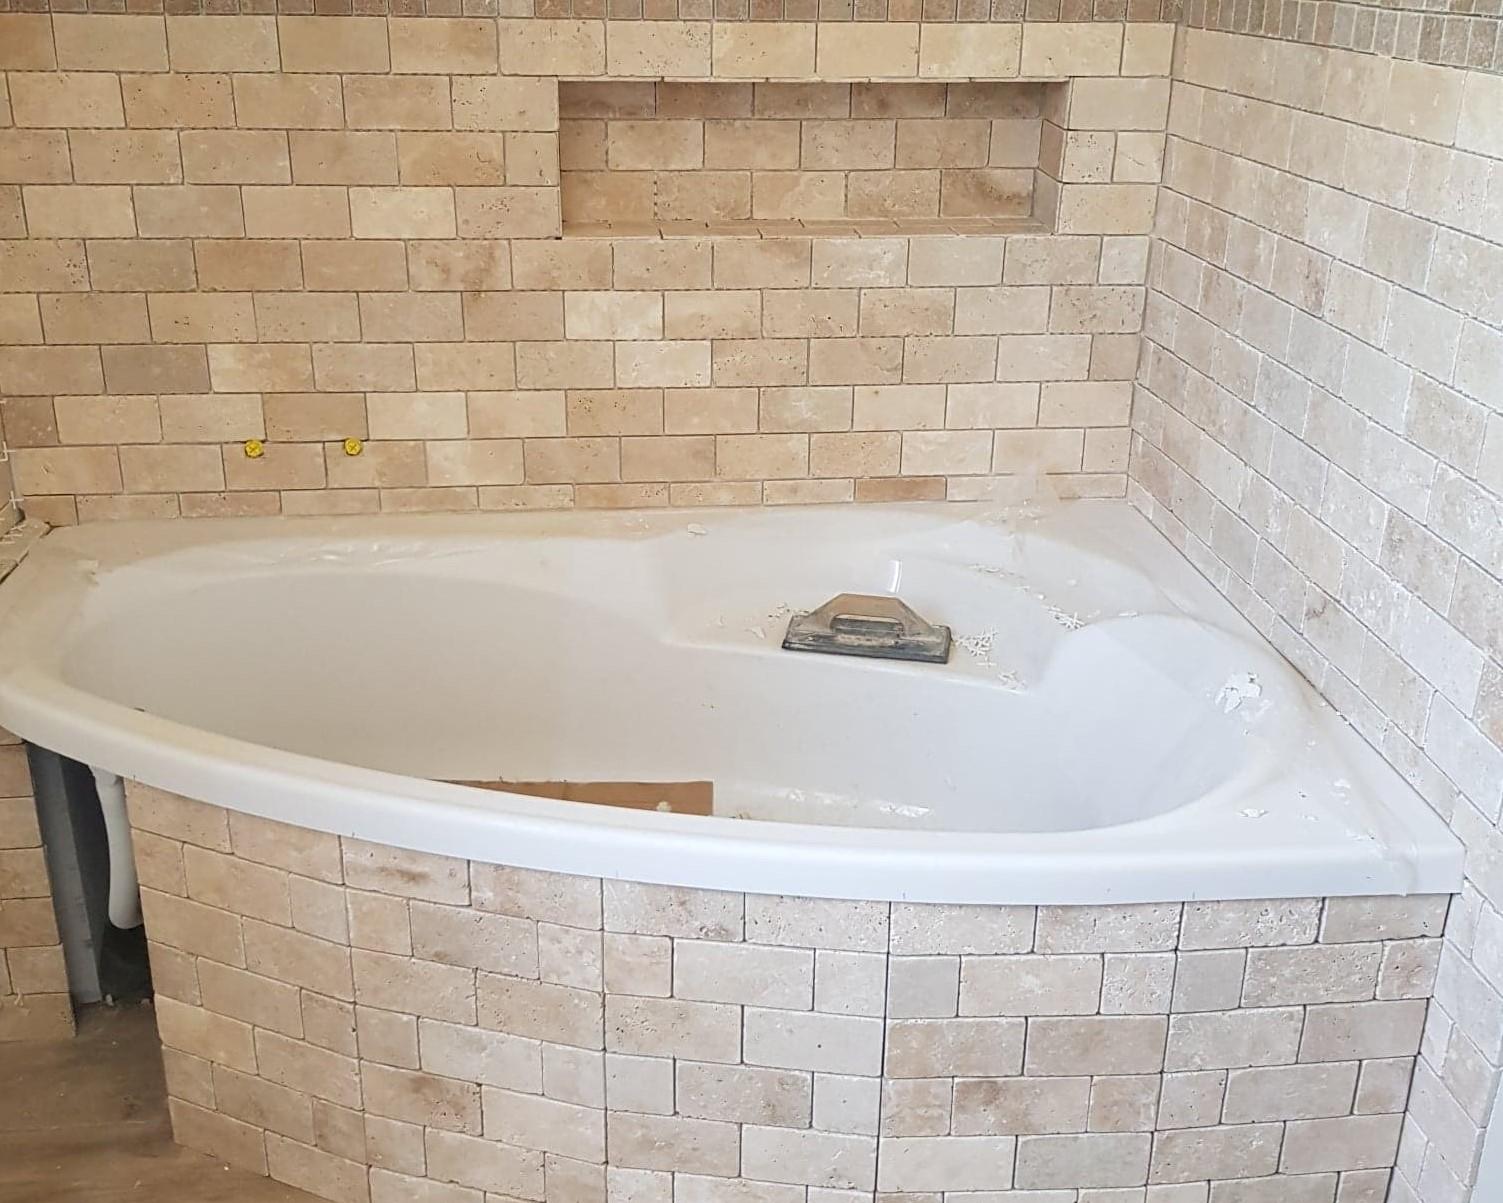 Habillage bas de baignoire d'angle